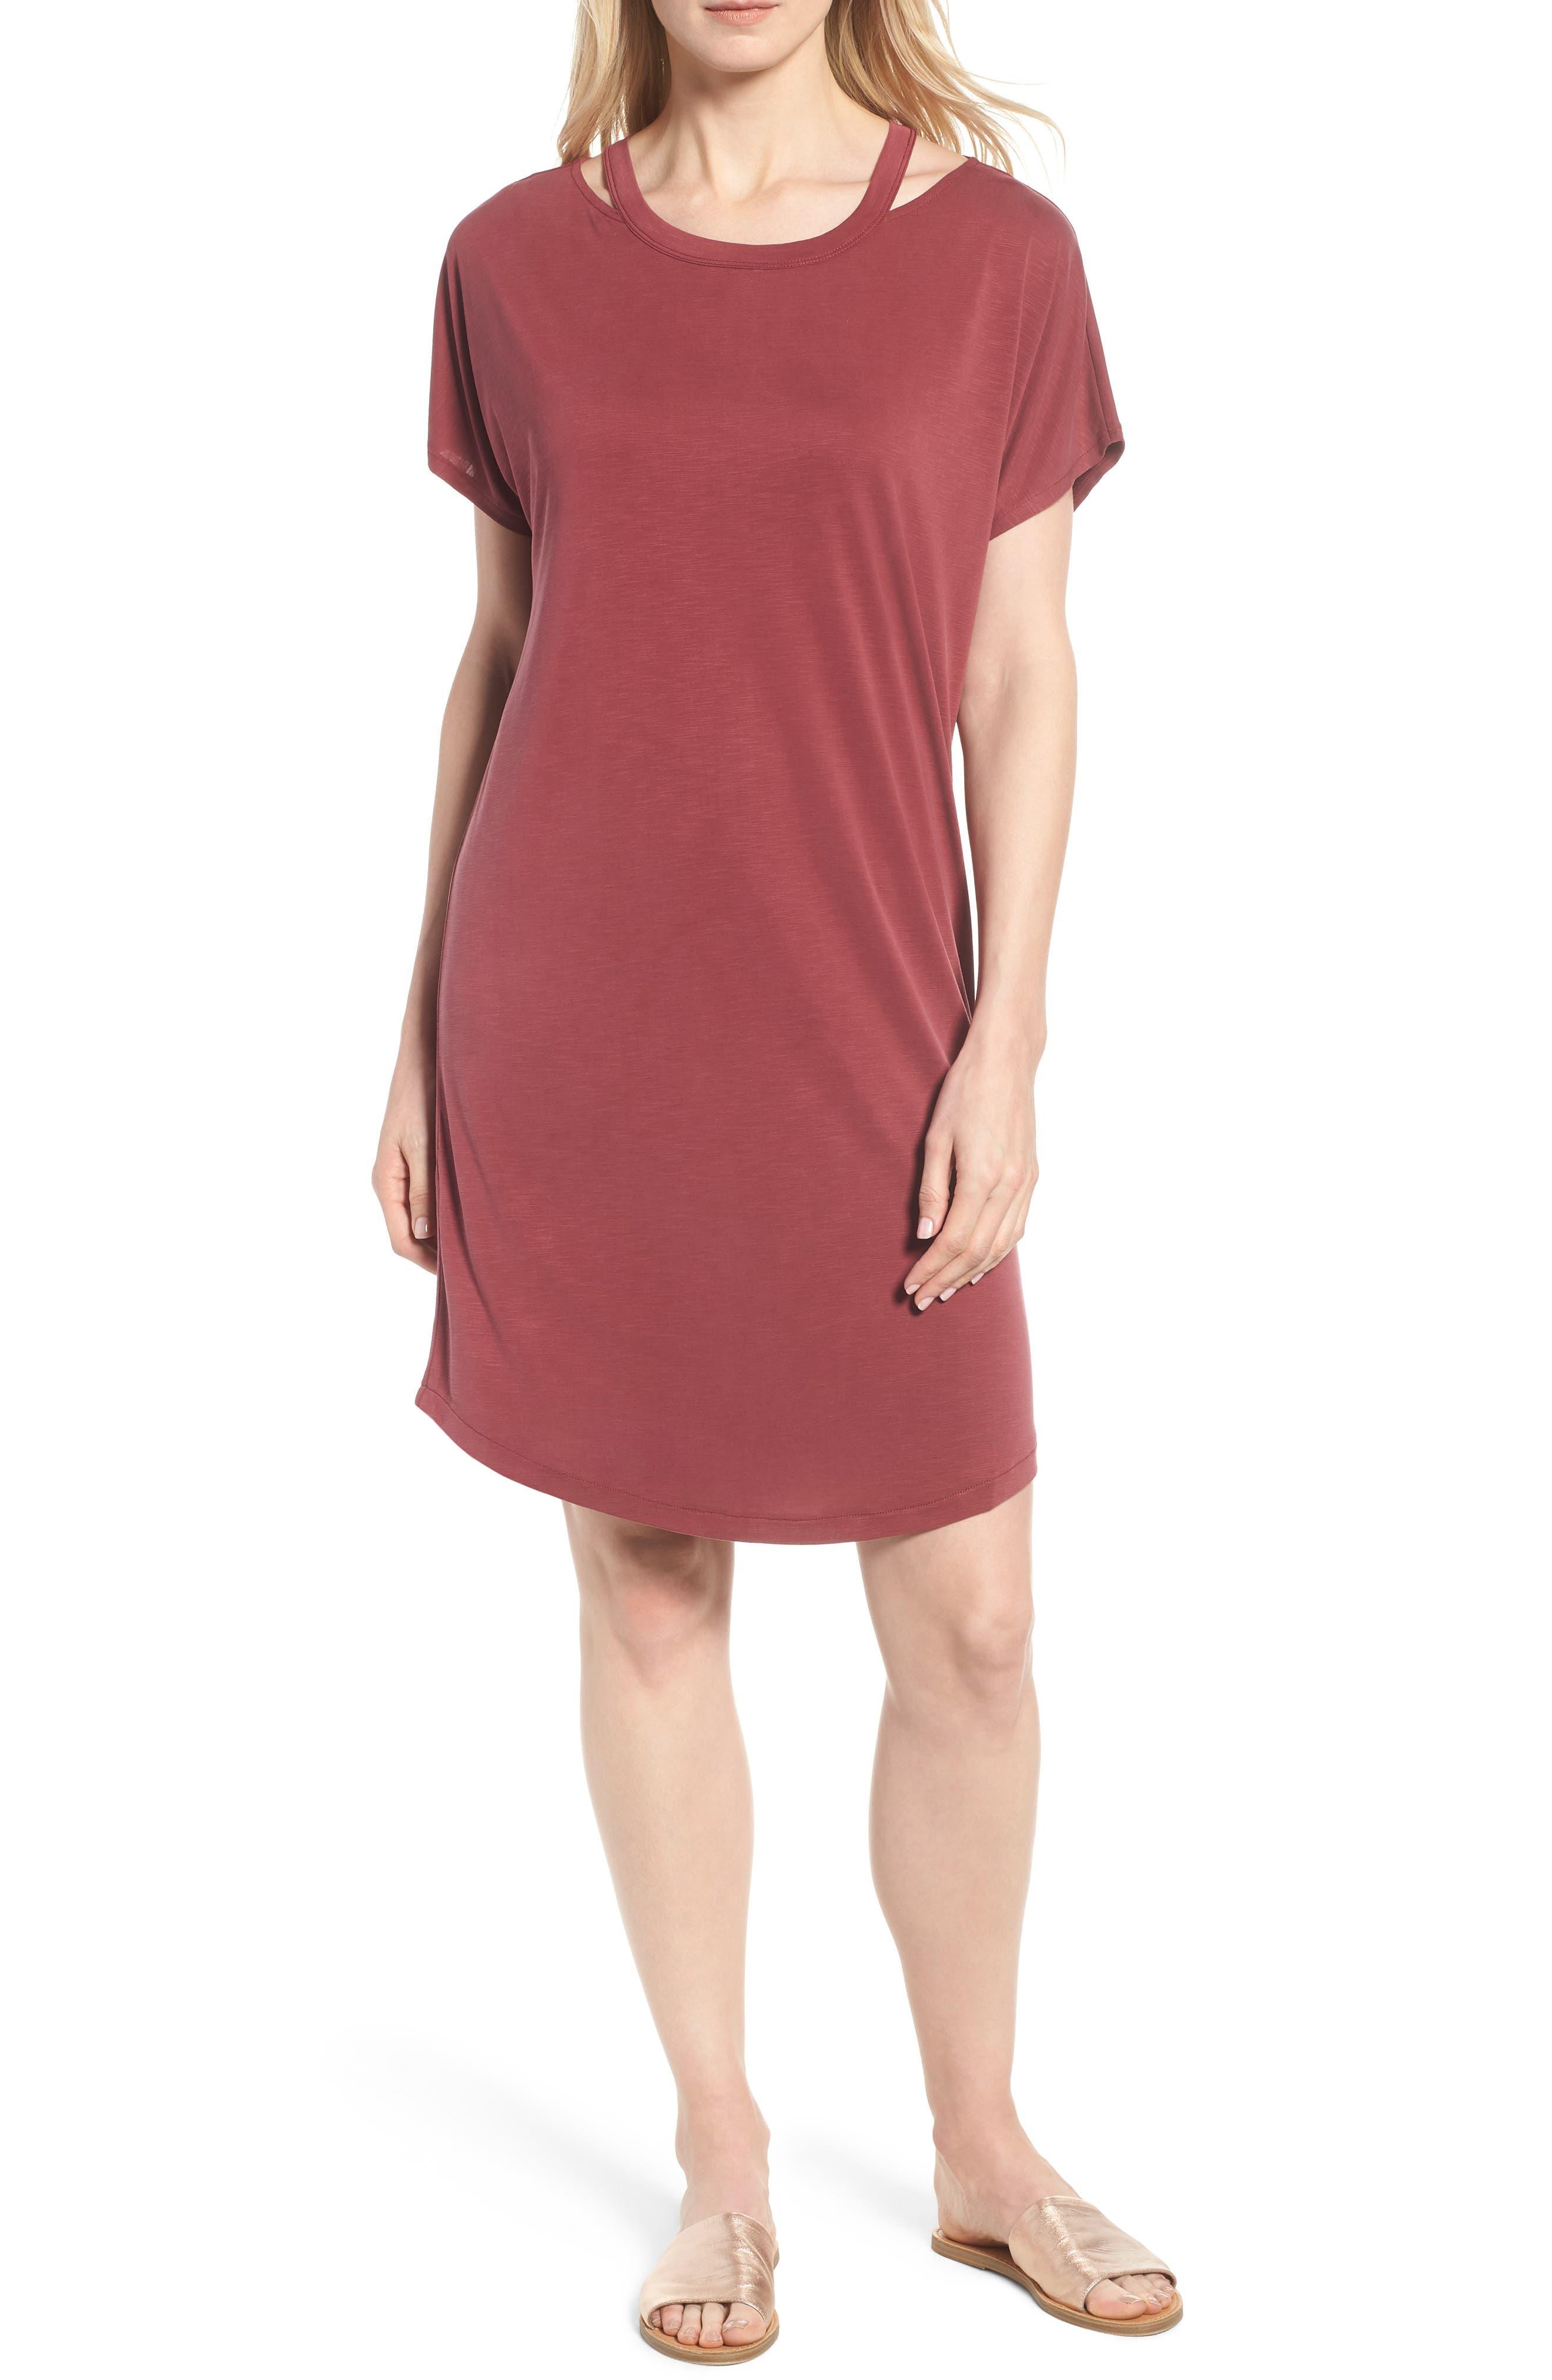 Open Road Dress,                             Main thumbnail 1, color,                             Washed Raisin